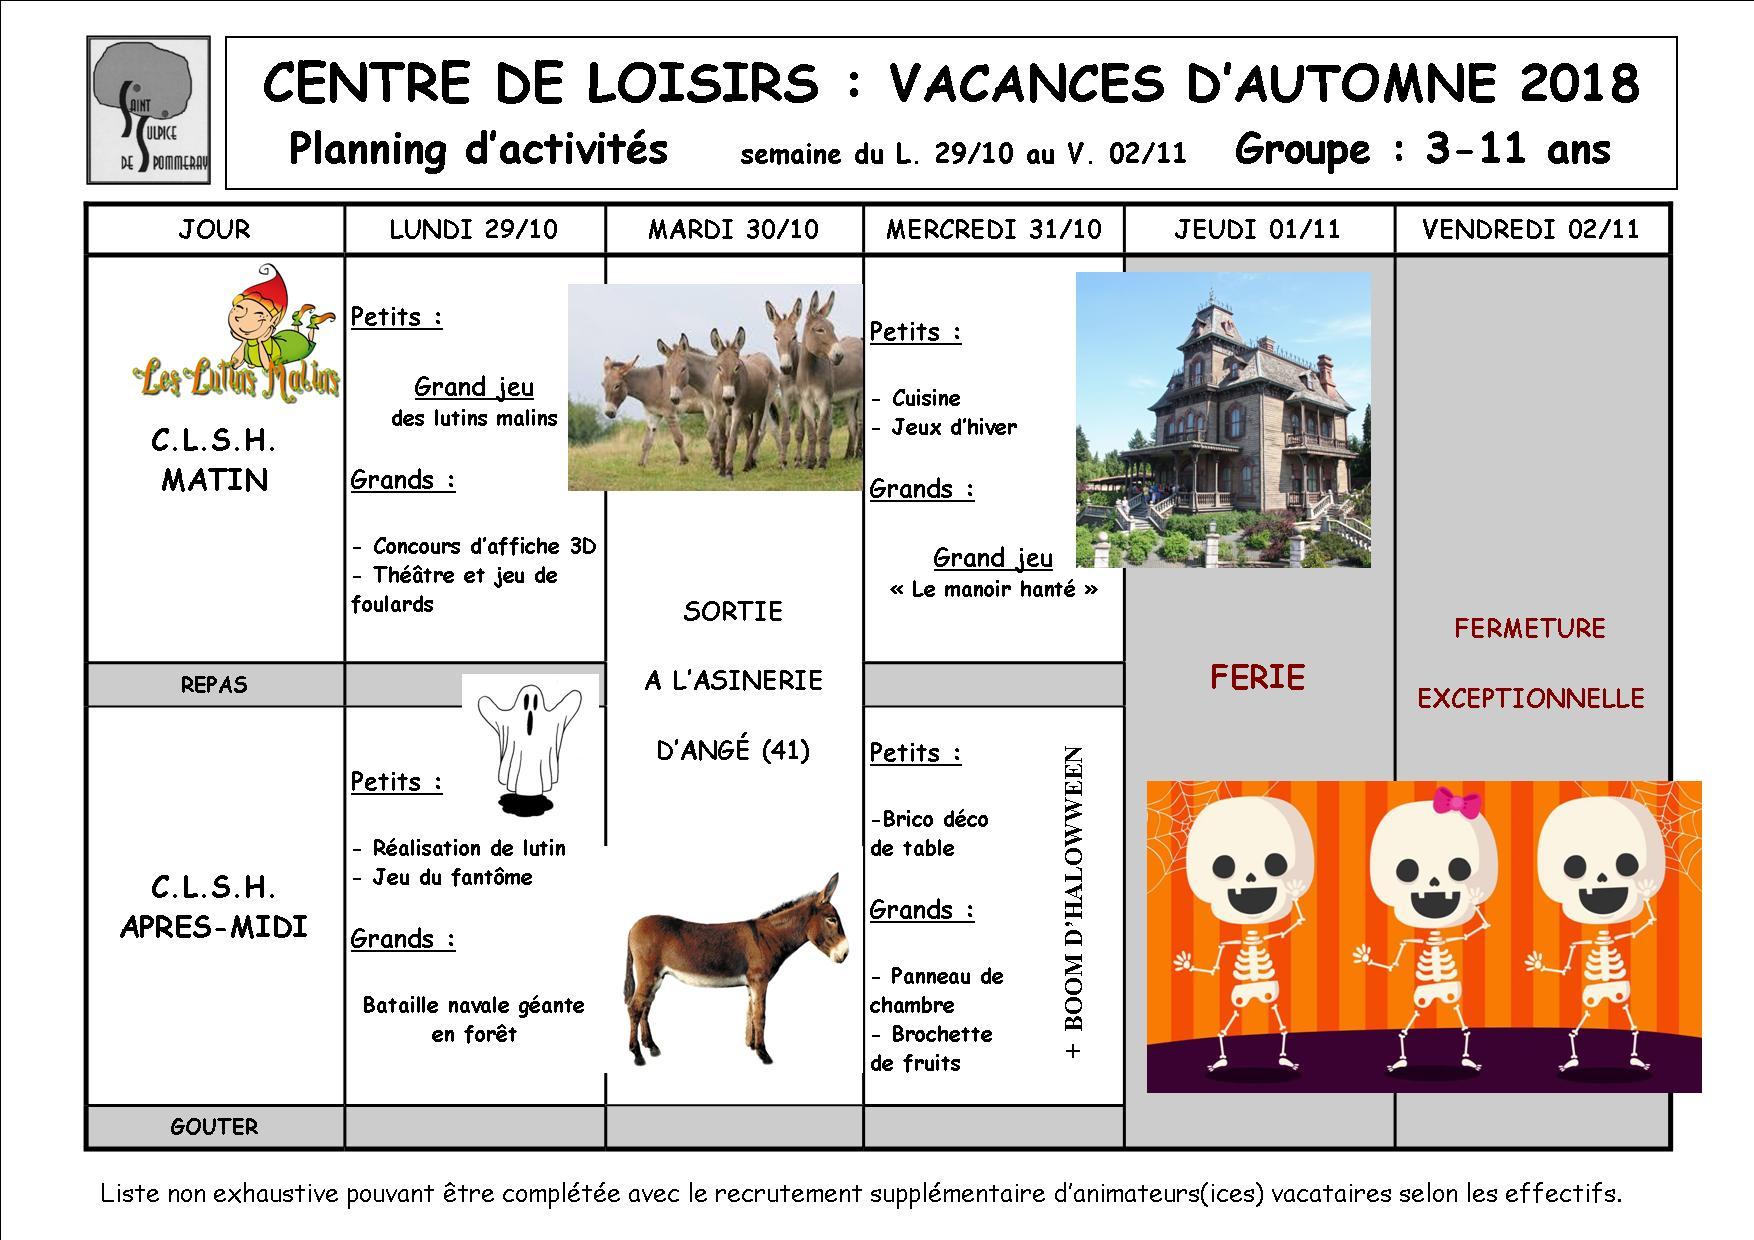 Vacances d'automne 2018, semaine 2